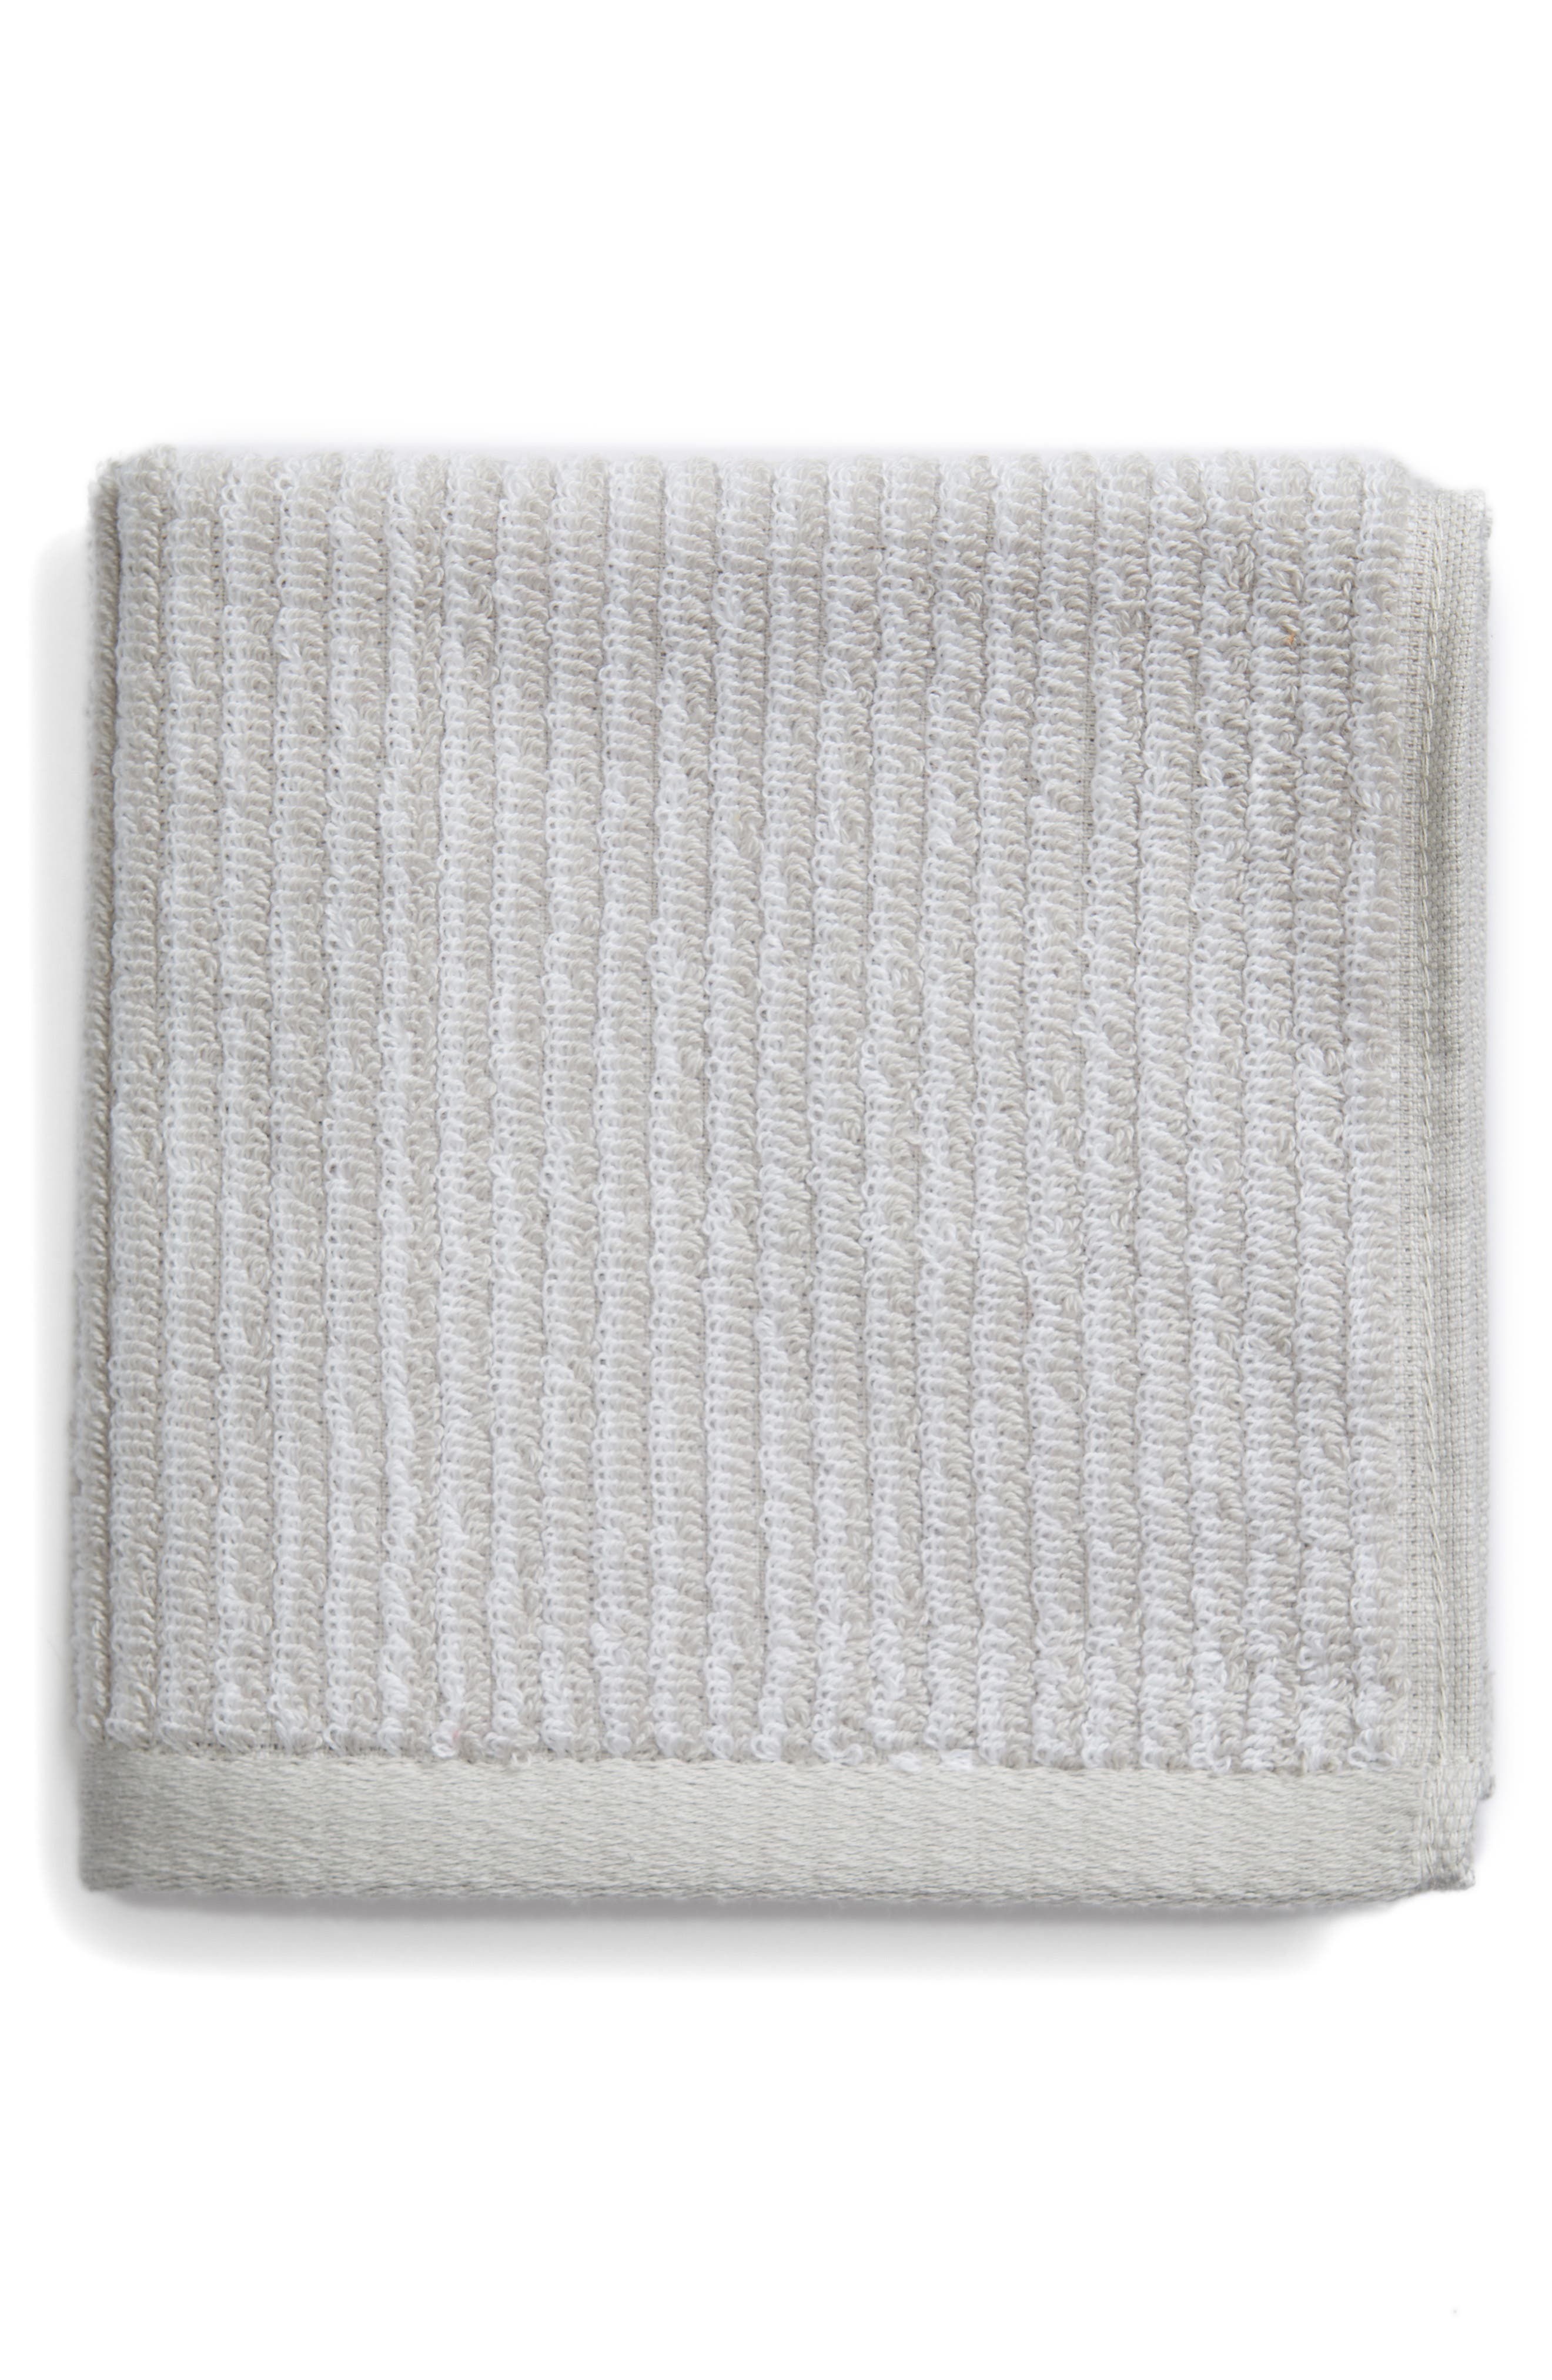 Ezra Stripe Washcloth,                             Main thumbnail 1, color,                             Grey Vapor